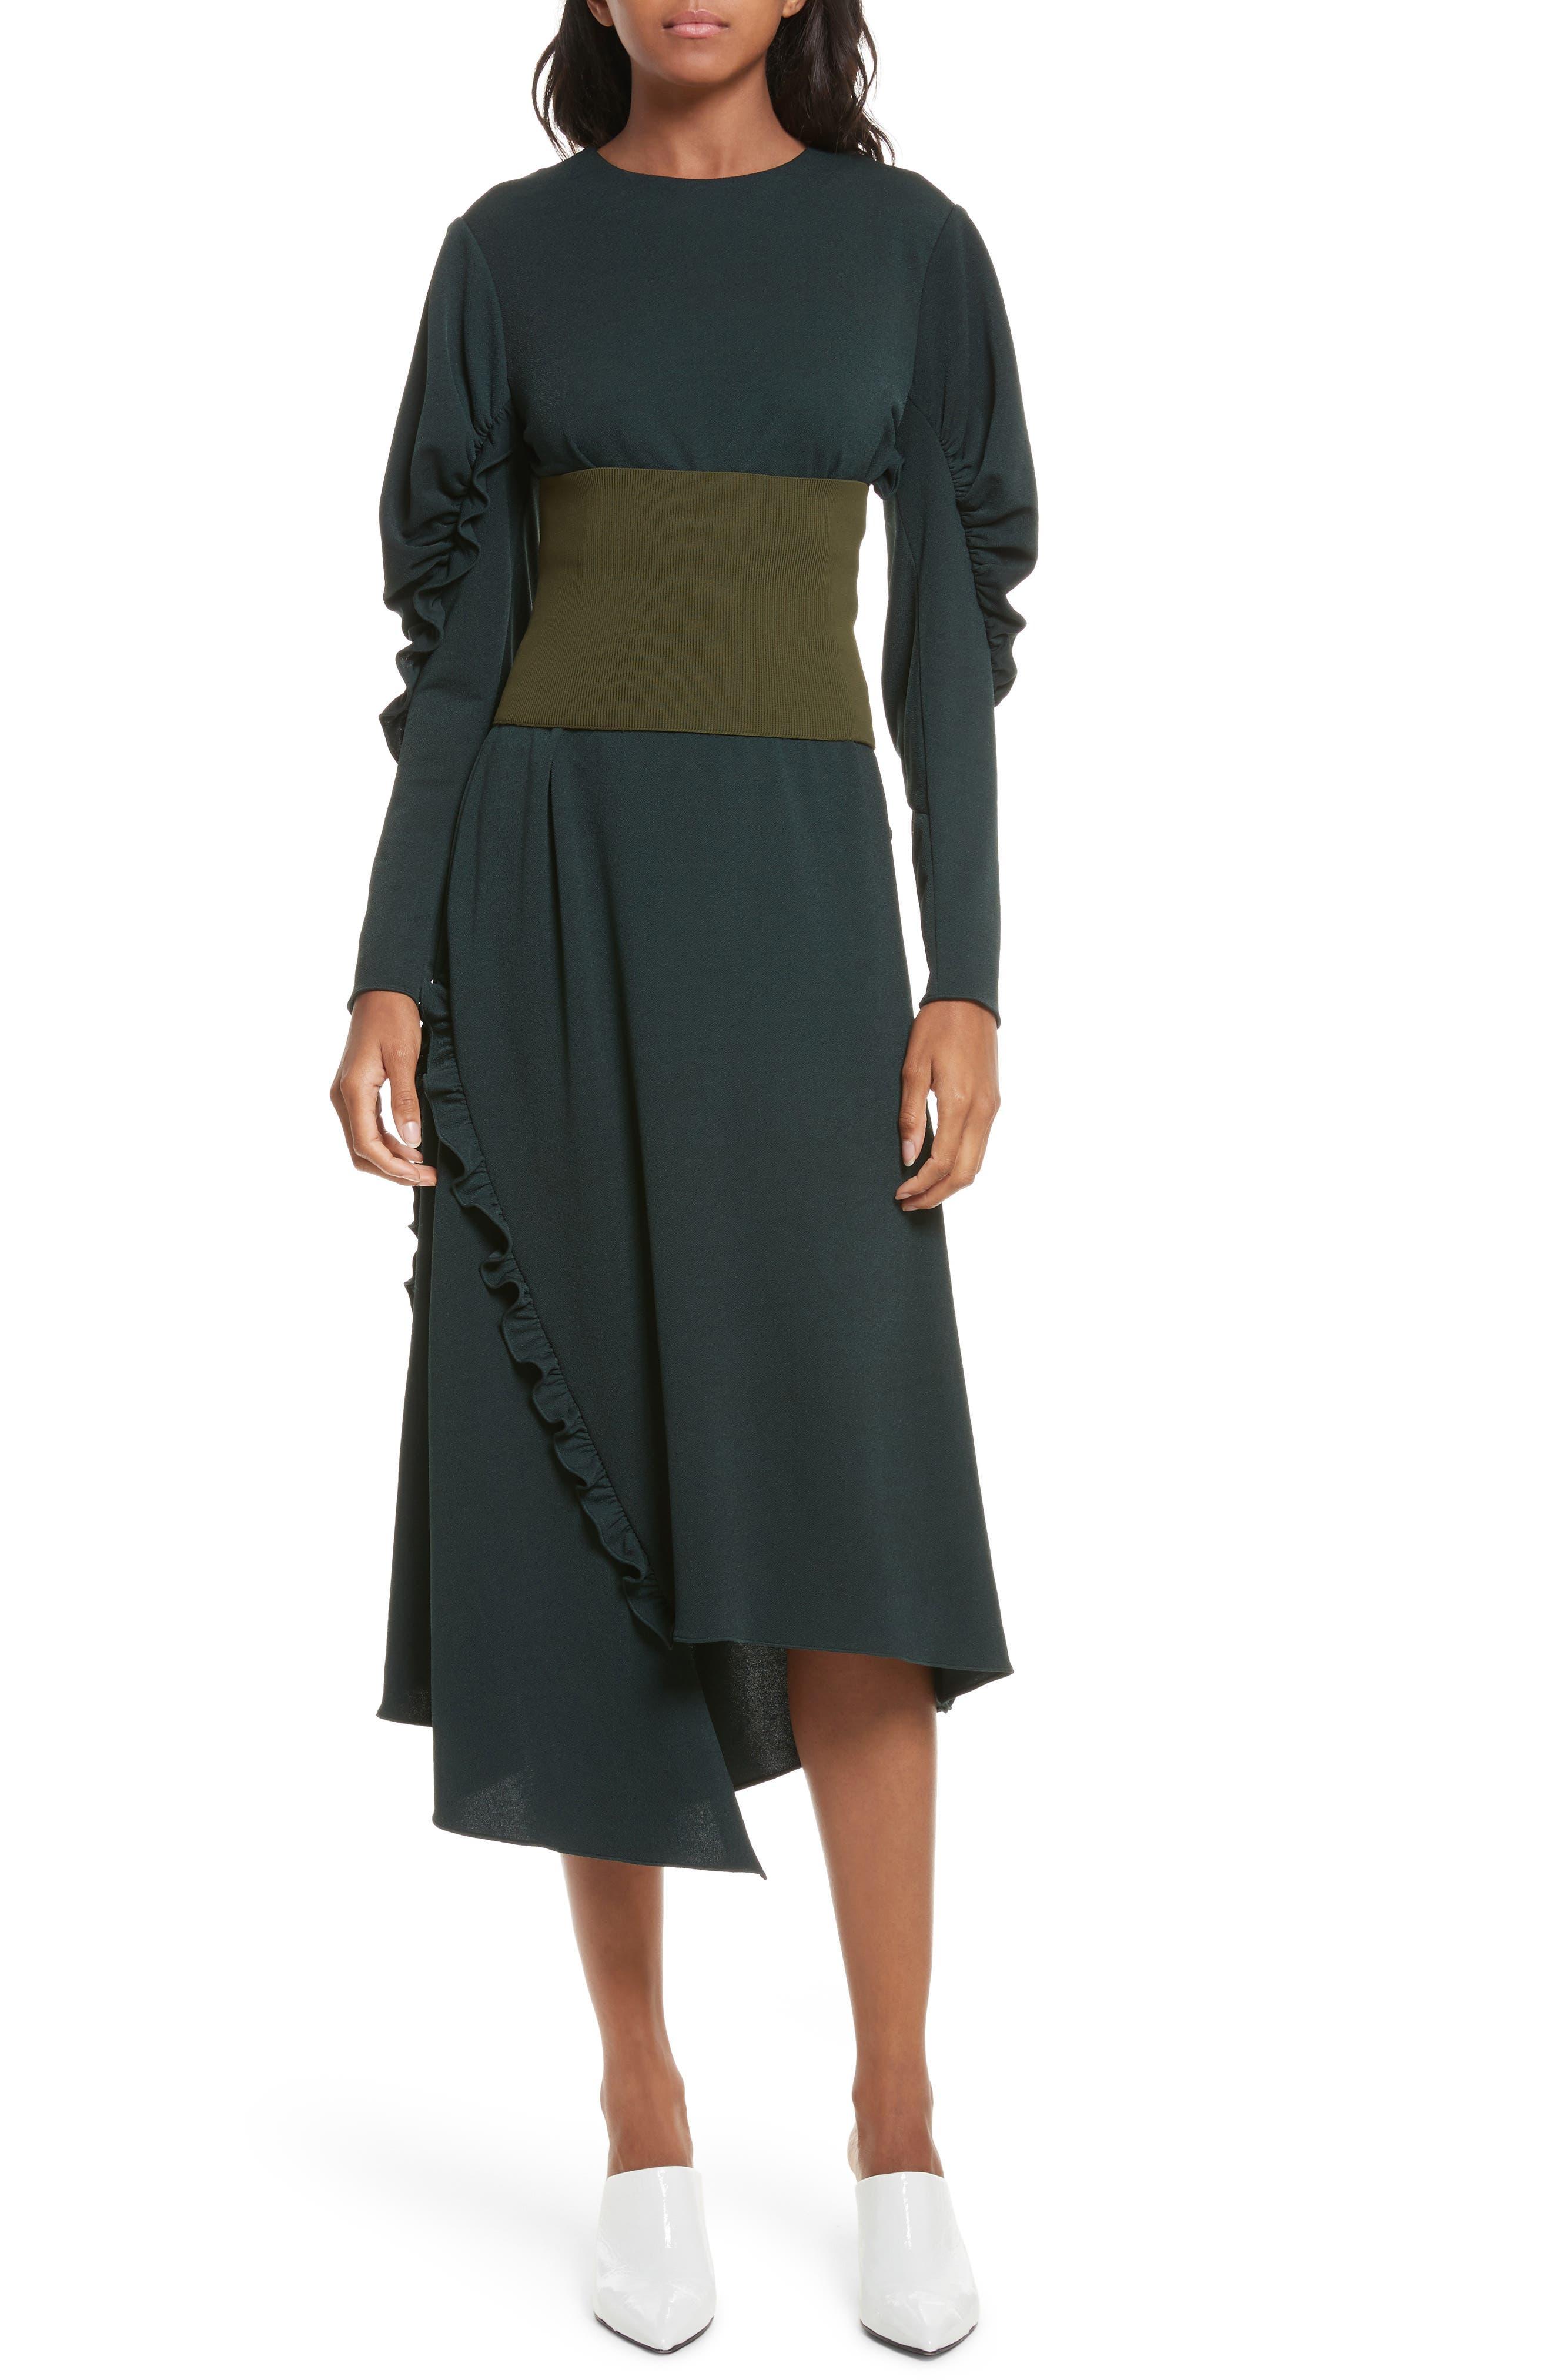 Lace-Up Knit Corset,                         Main,                         color, Loden